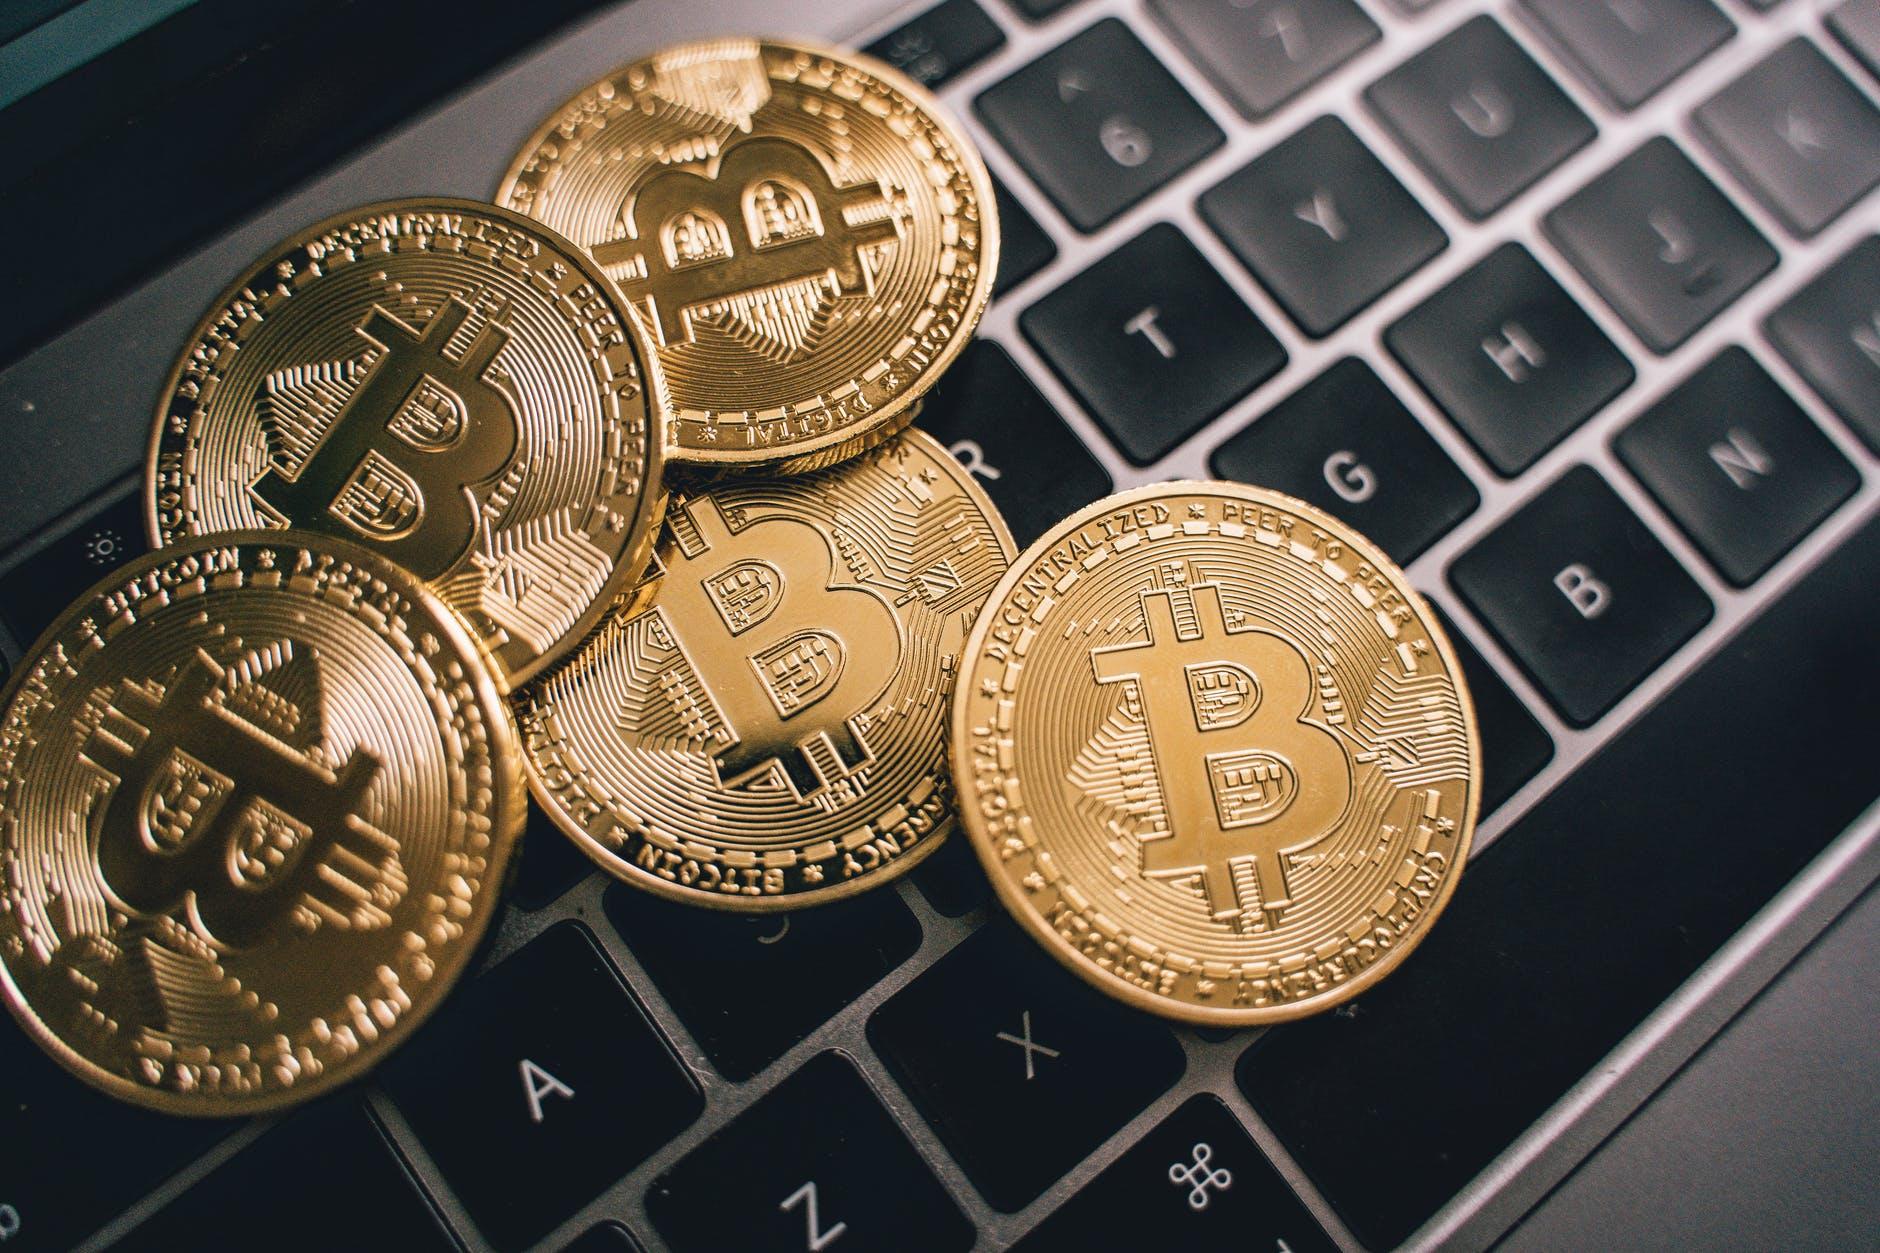 Bitcoin va putea fi trimis printr-un simplu tweet